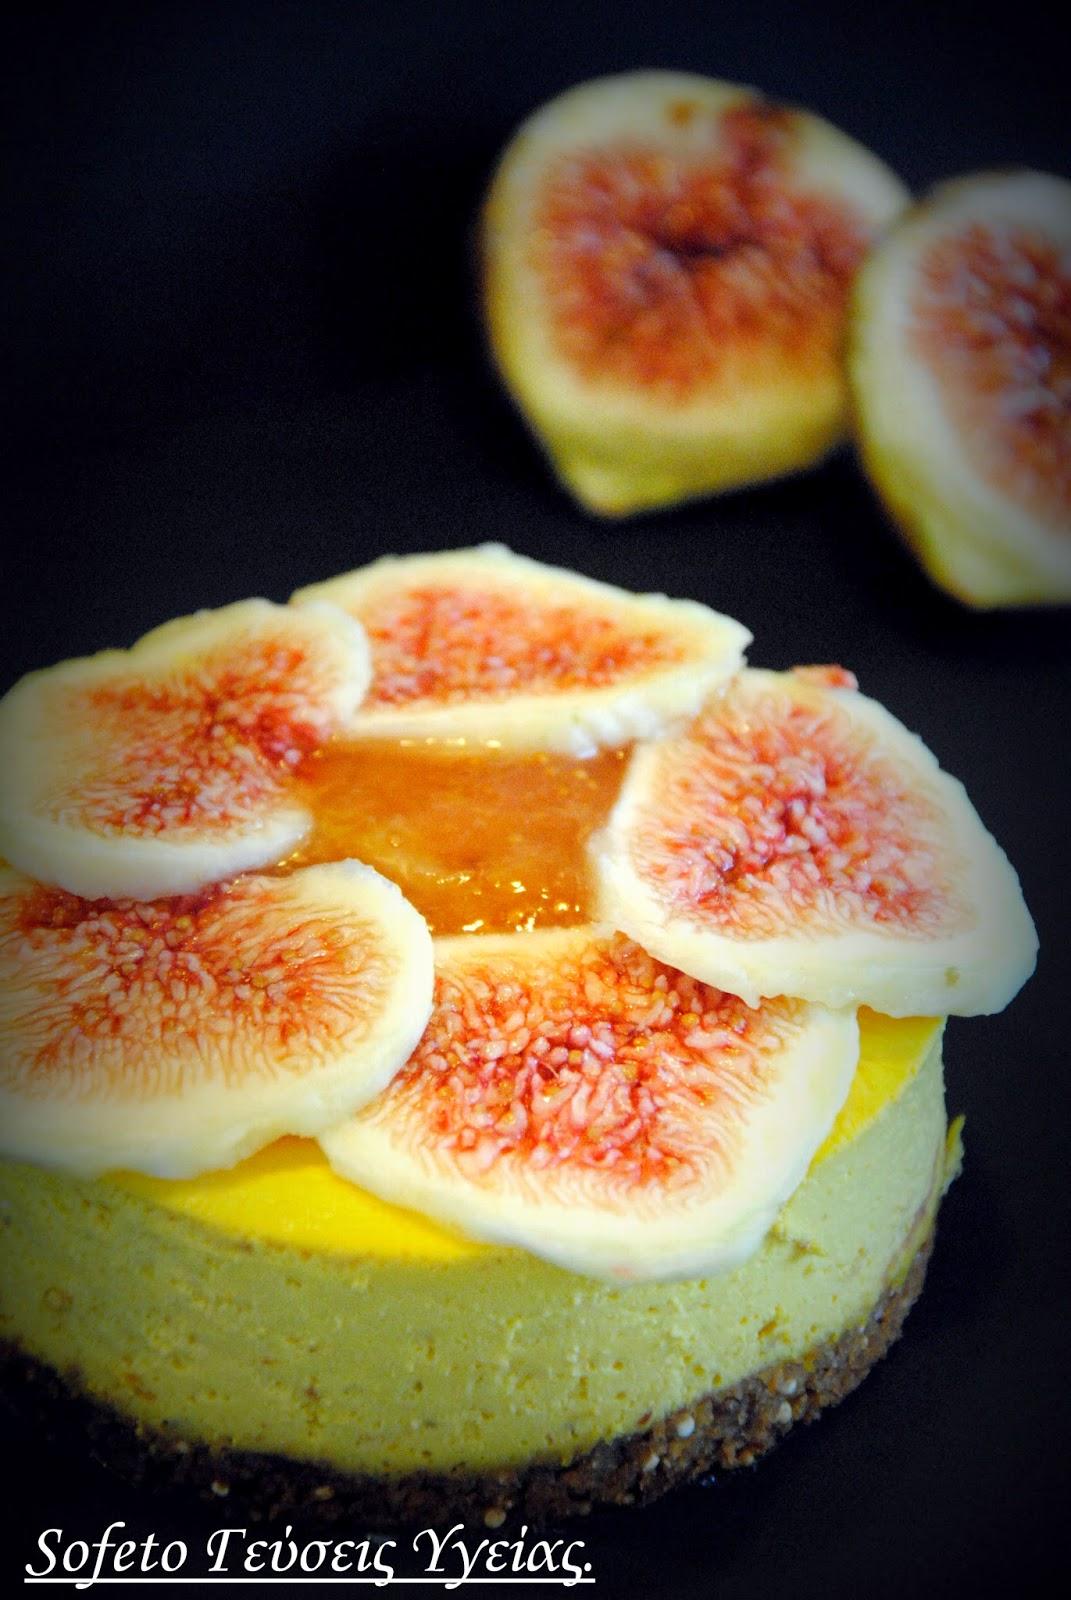 Cheese cake με φρέσκα σύκα και κρέμα  goji berries , χωρίς ζάχαρη .